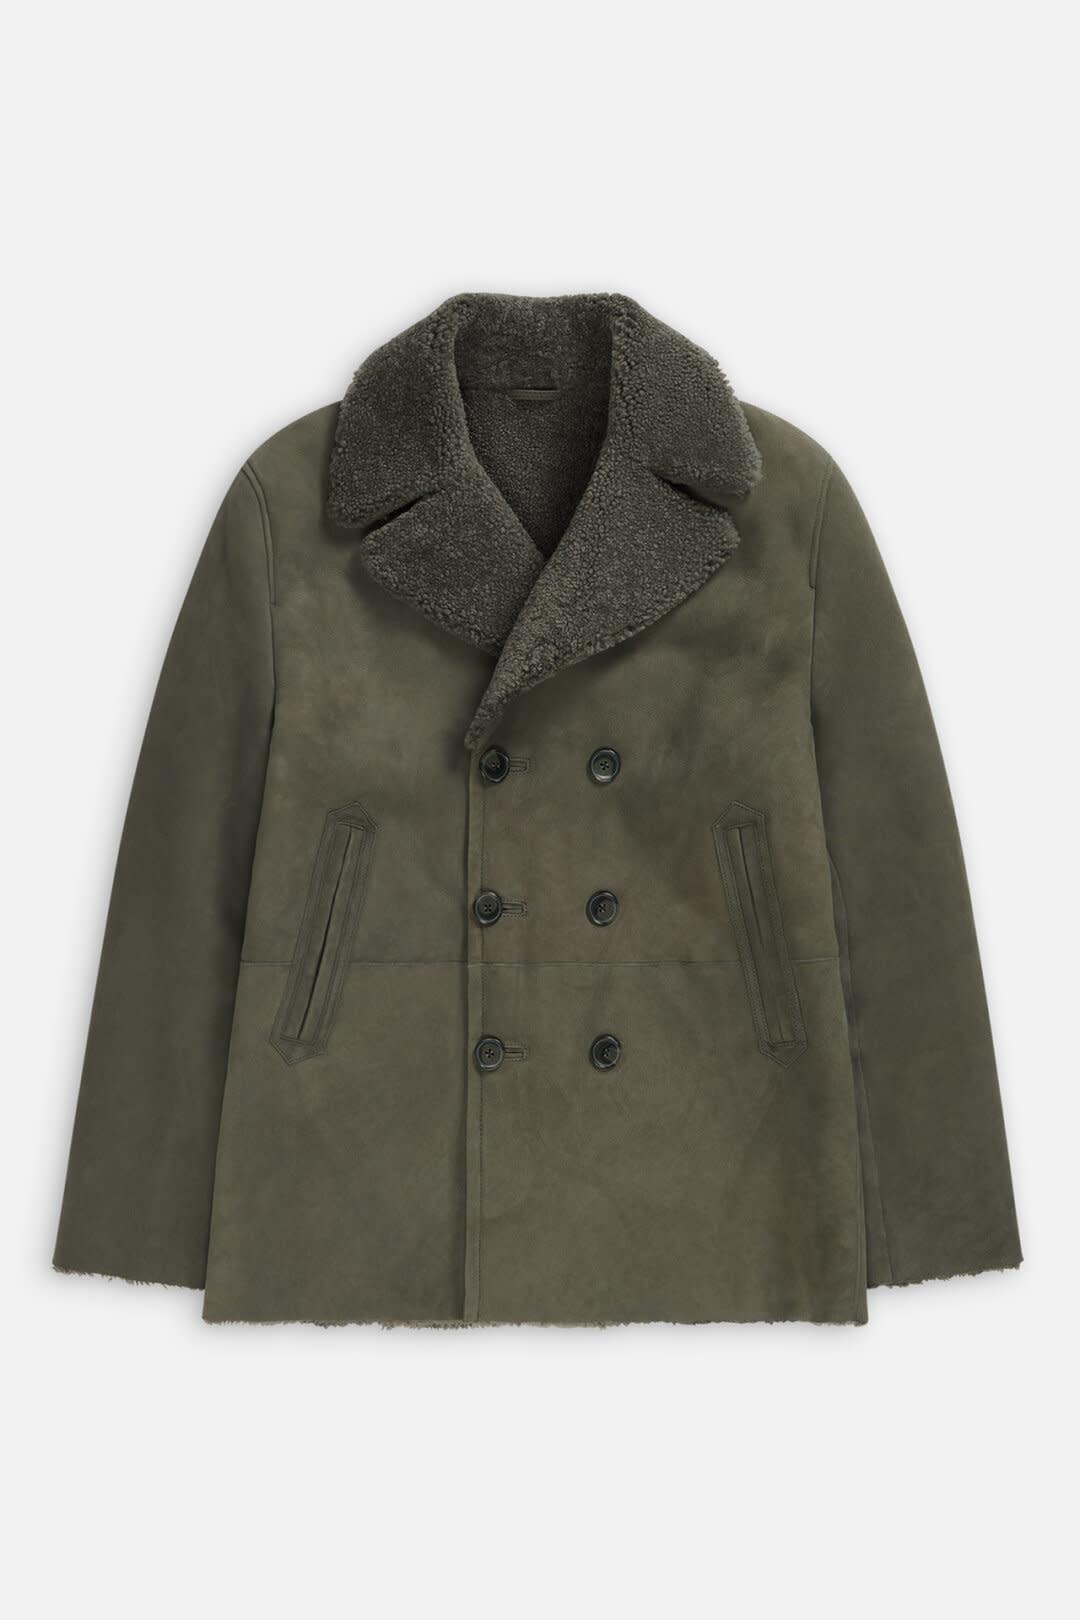 Shearling Jacket Muddy beige-1